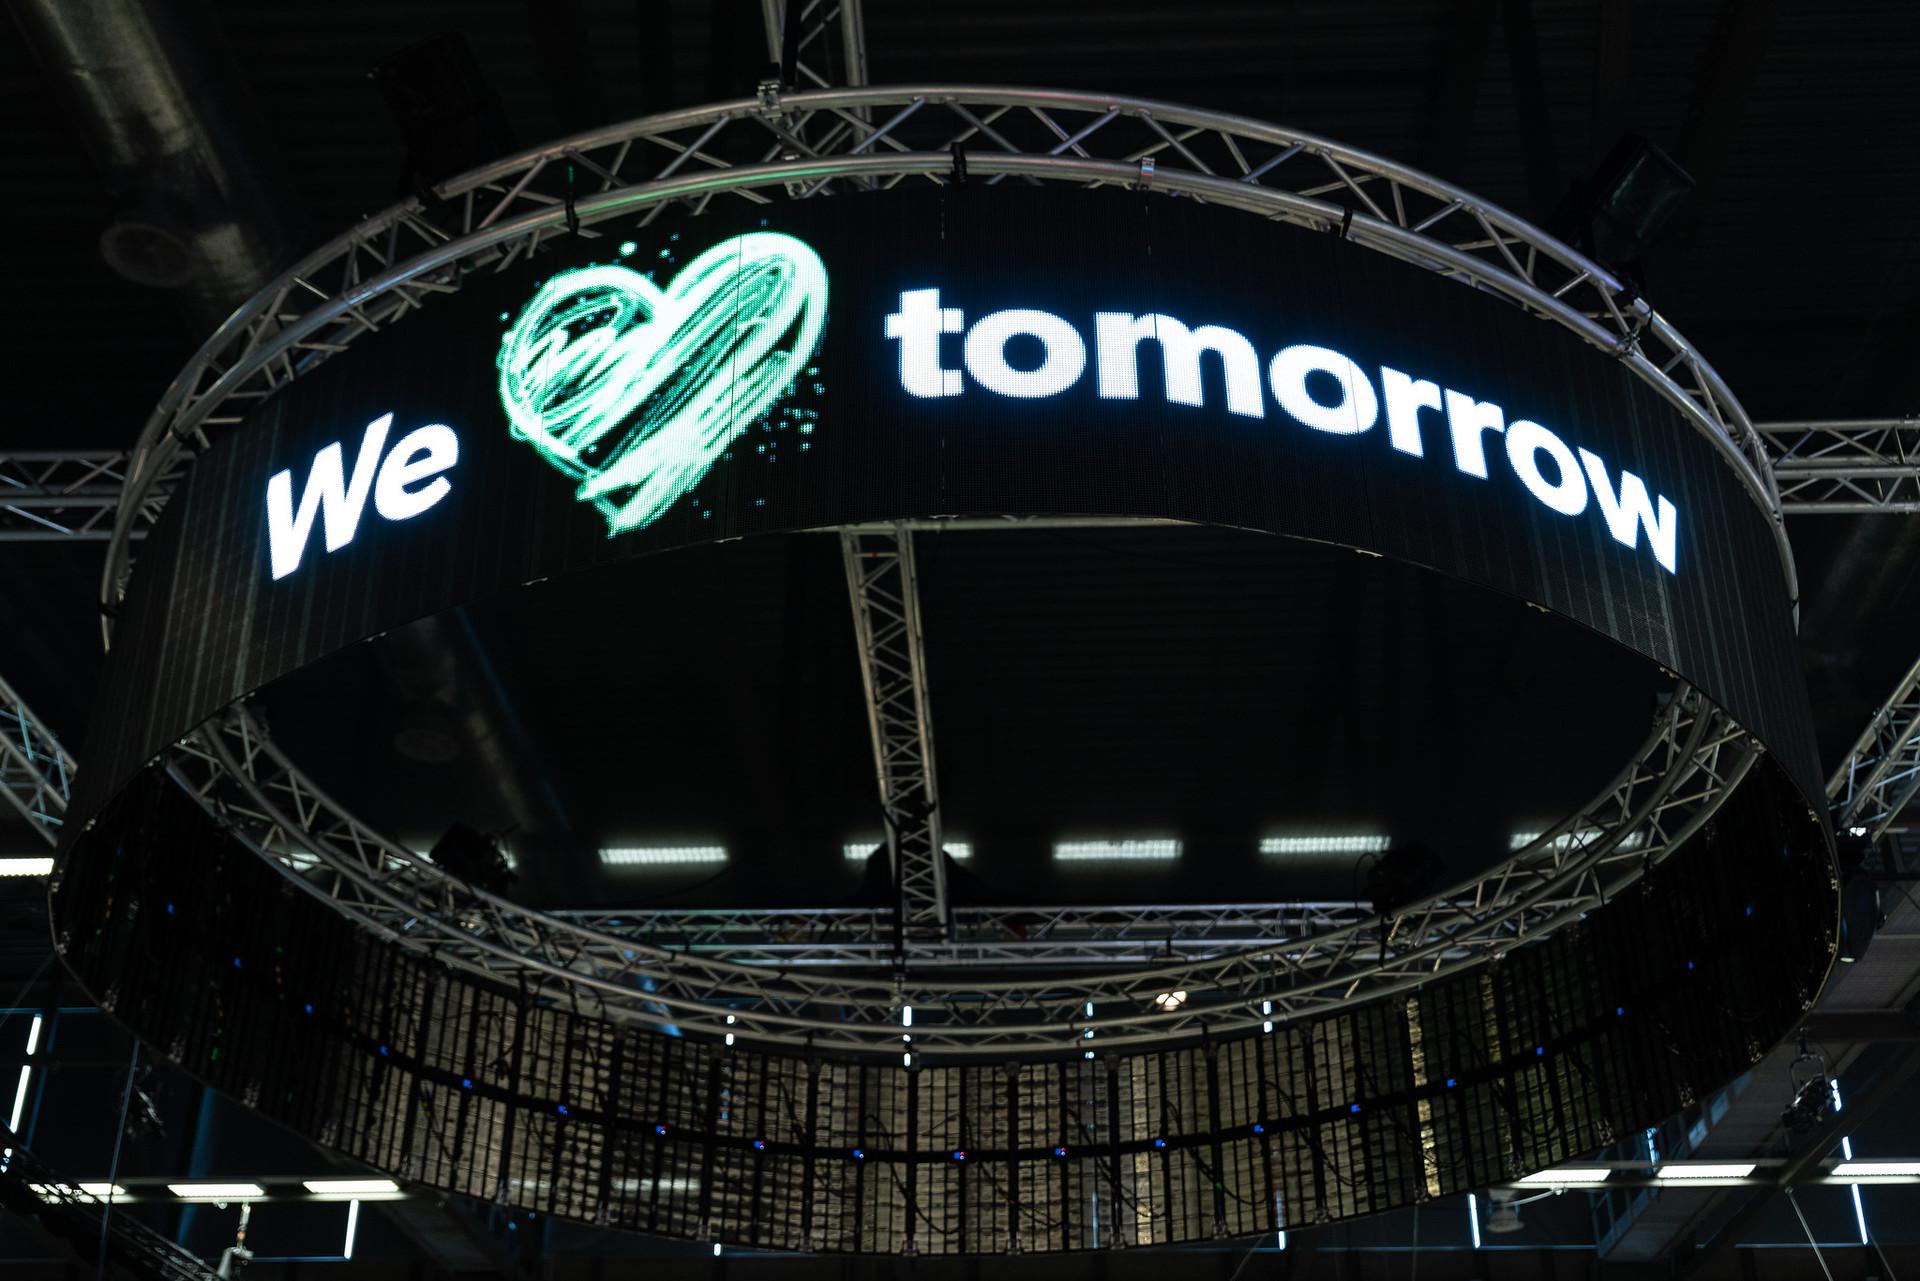 We love tomorrow